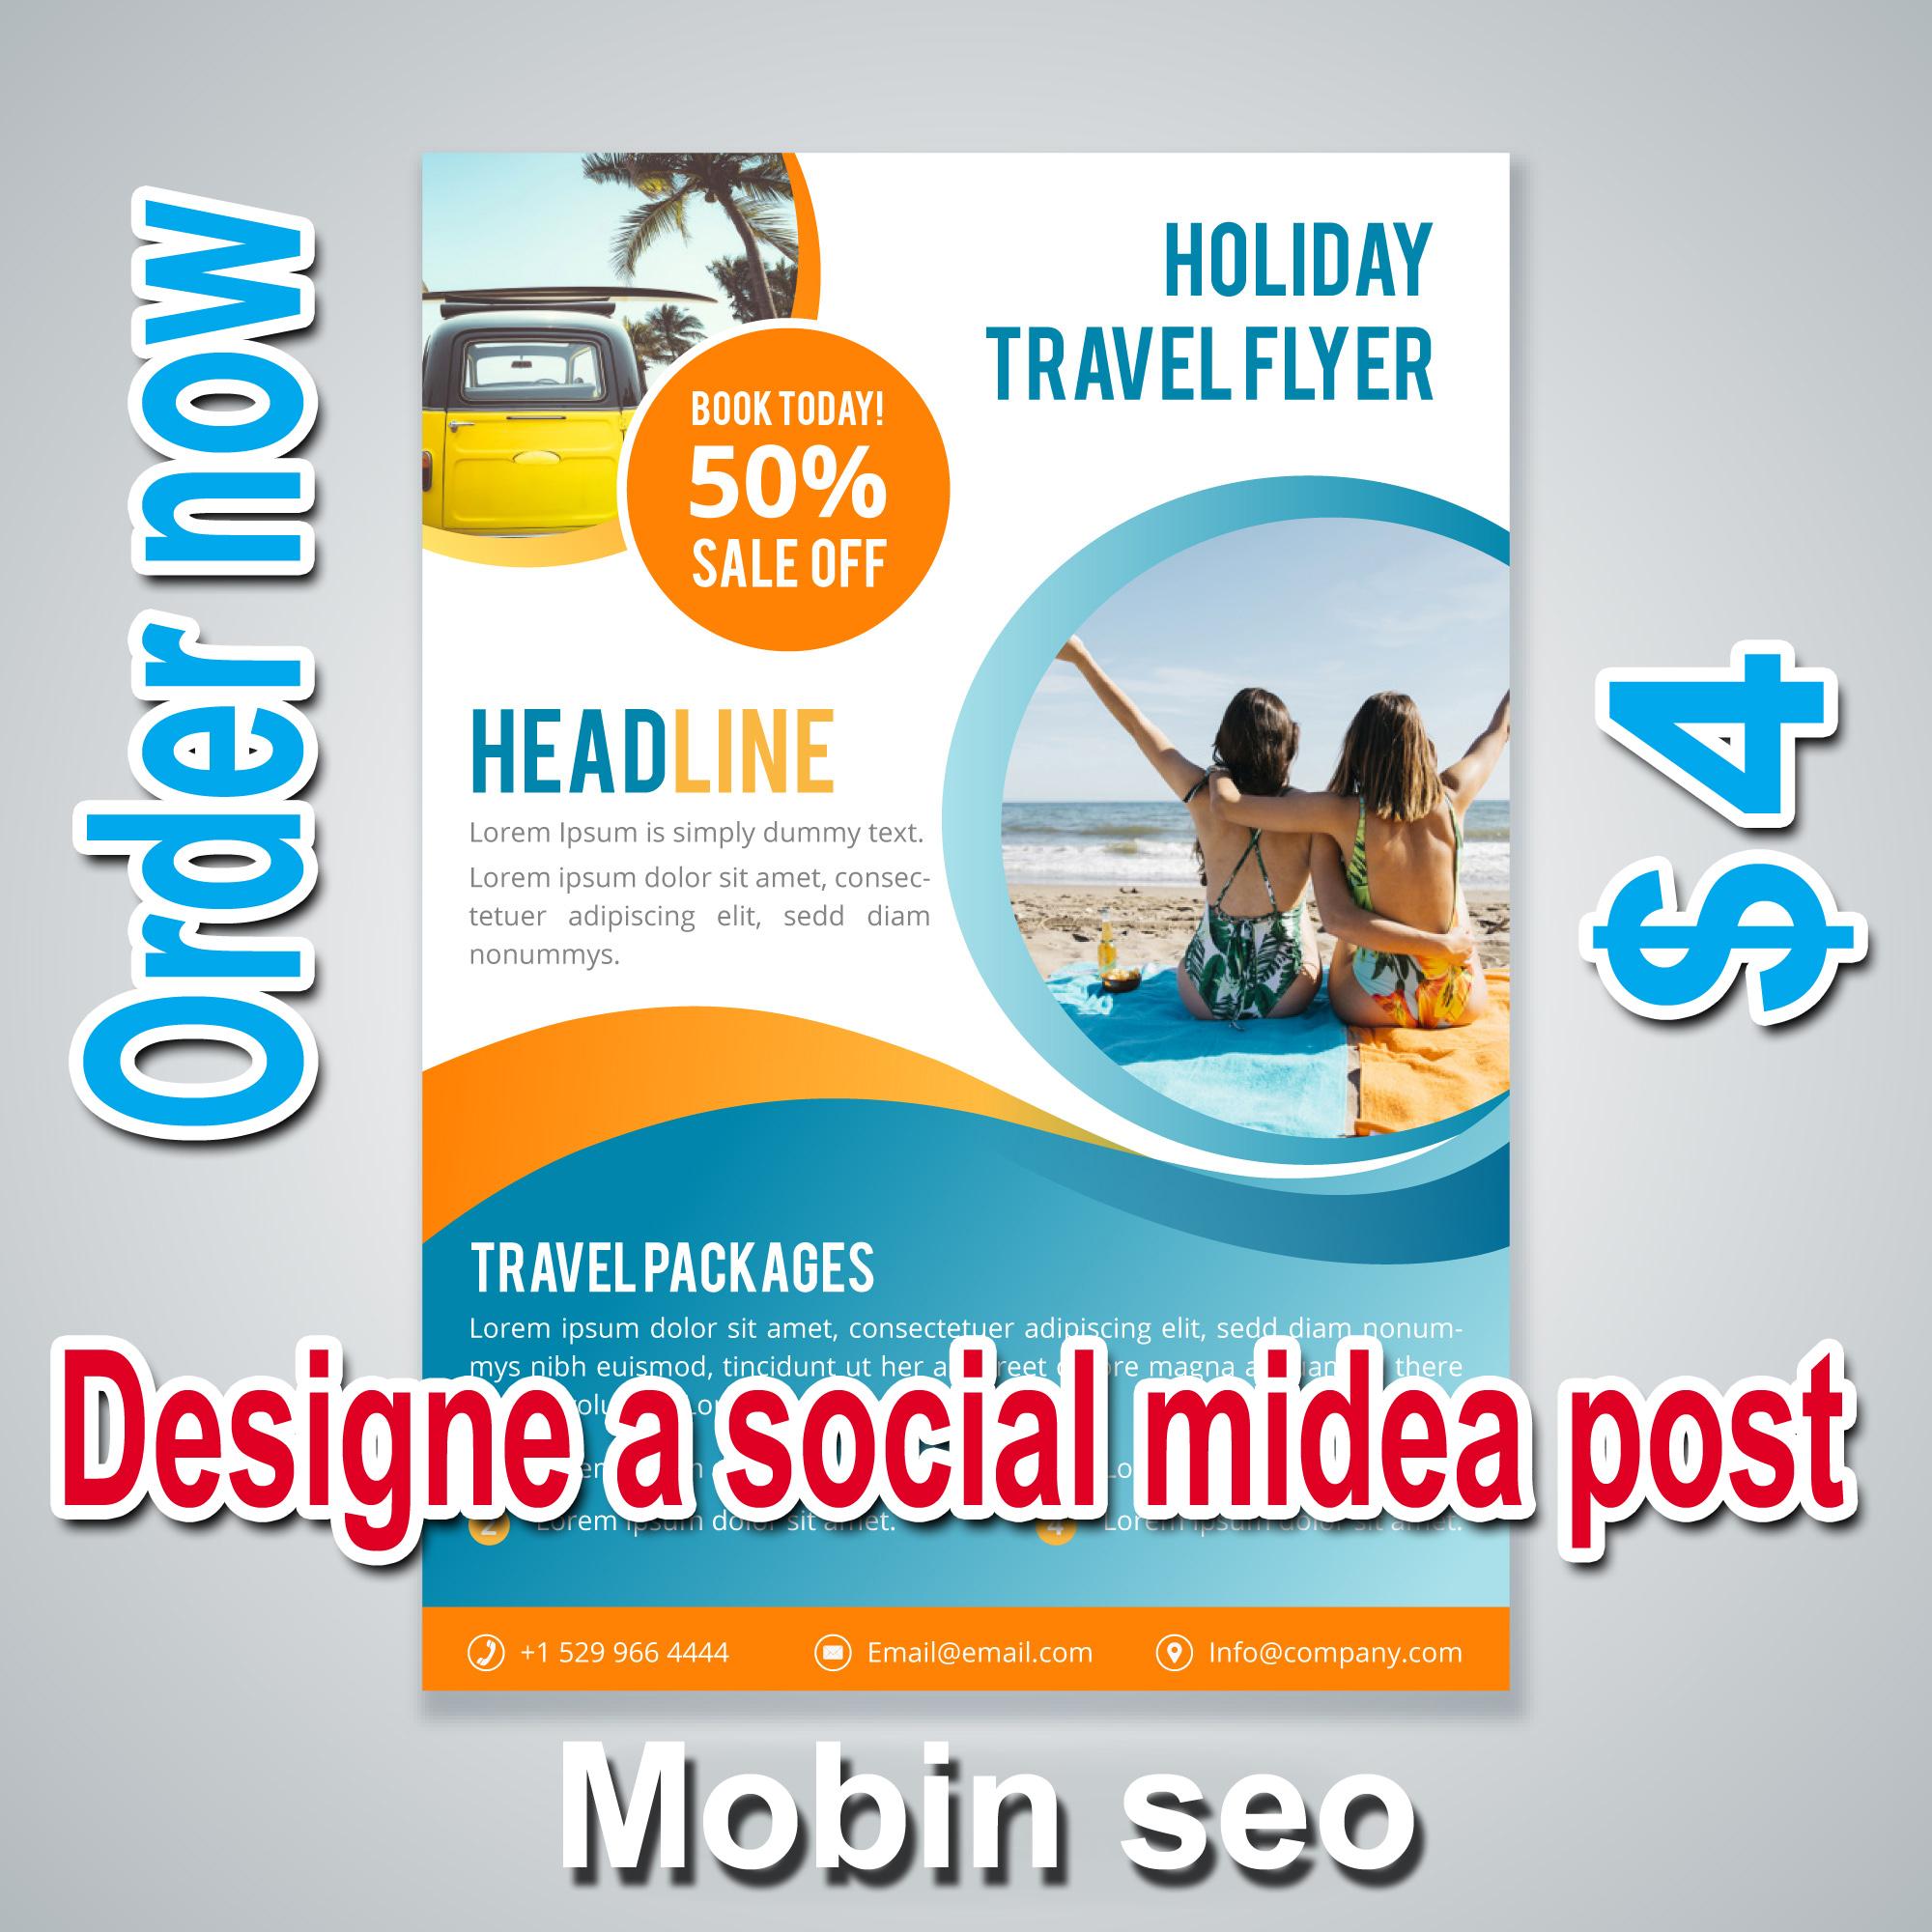 Designe high quality social midea post or flyer